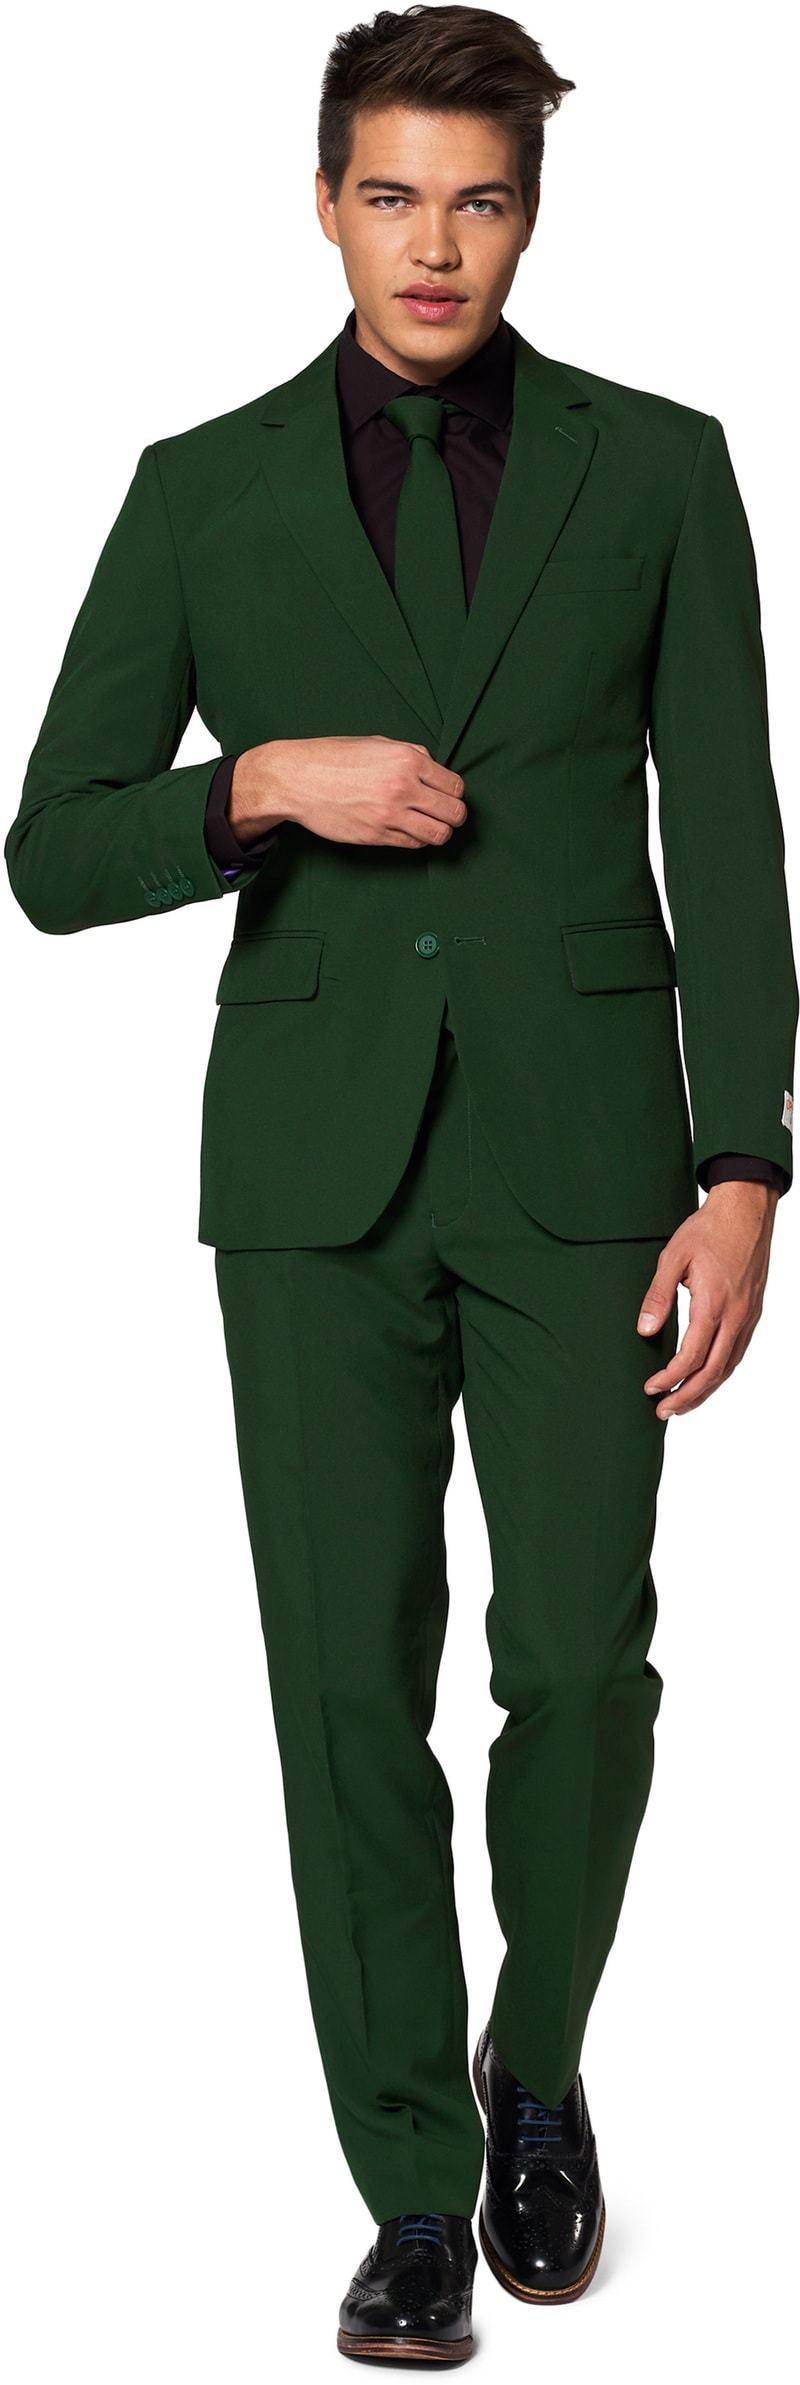 OppoSuits Kostuum Glorious Green foto 0